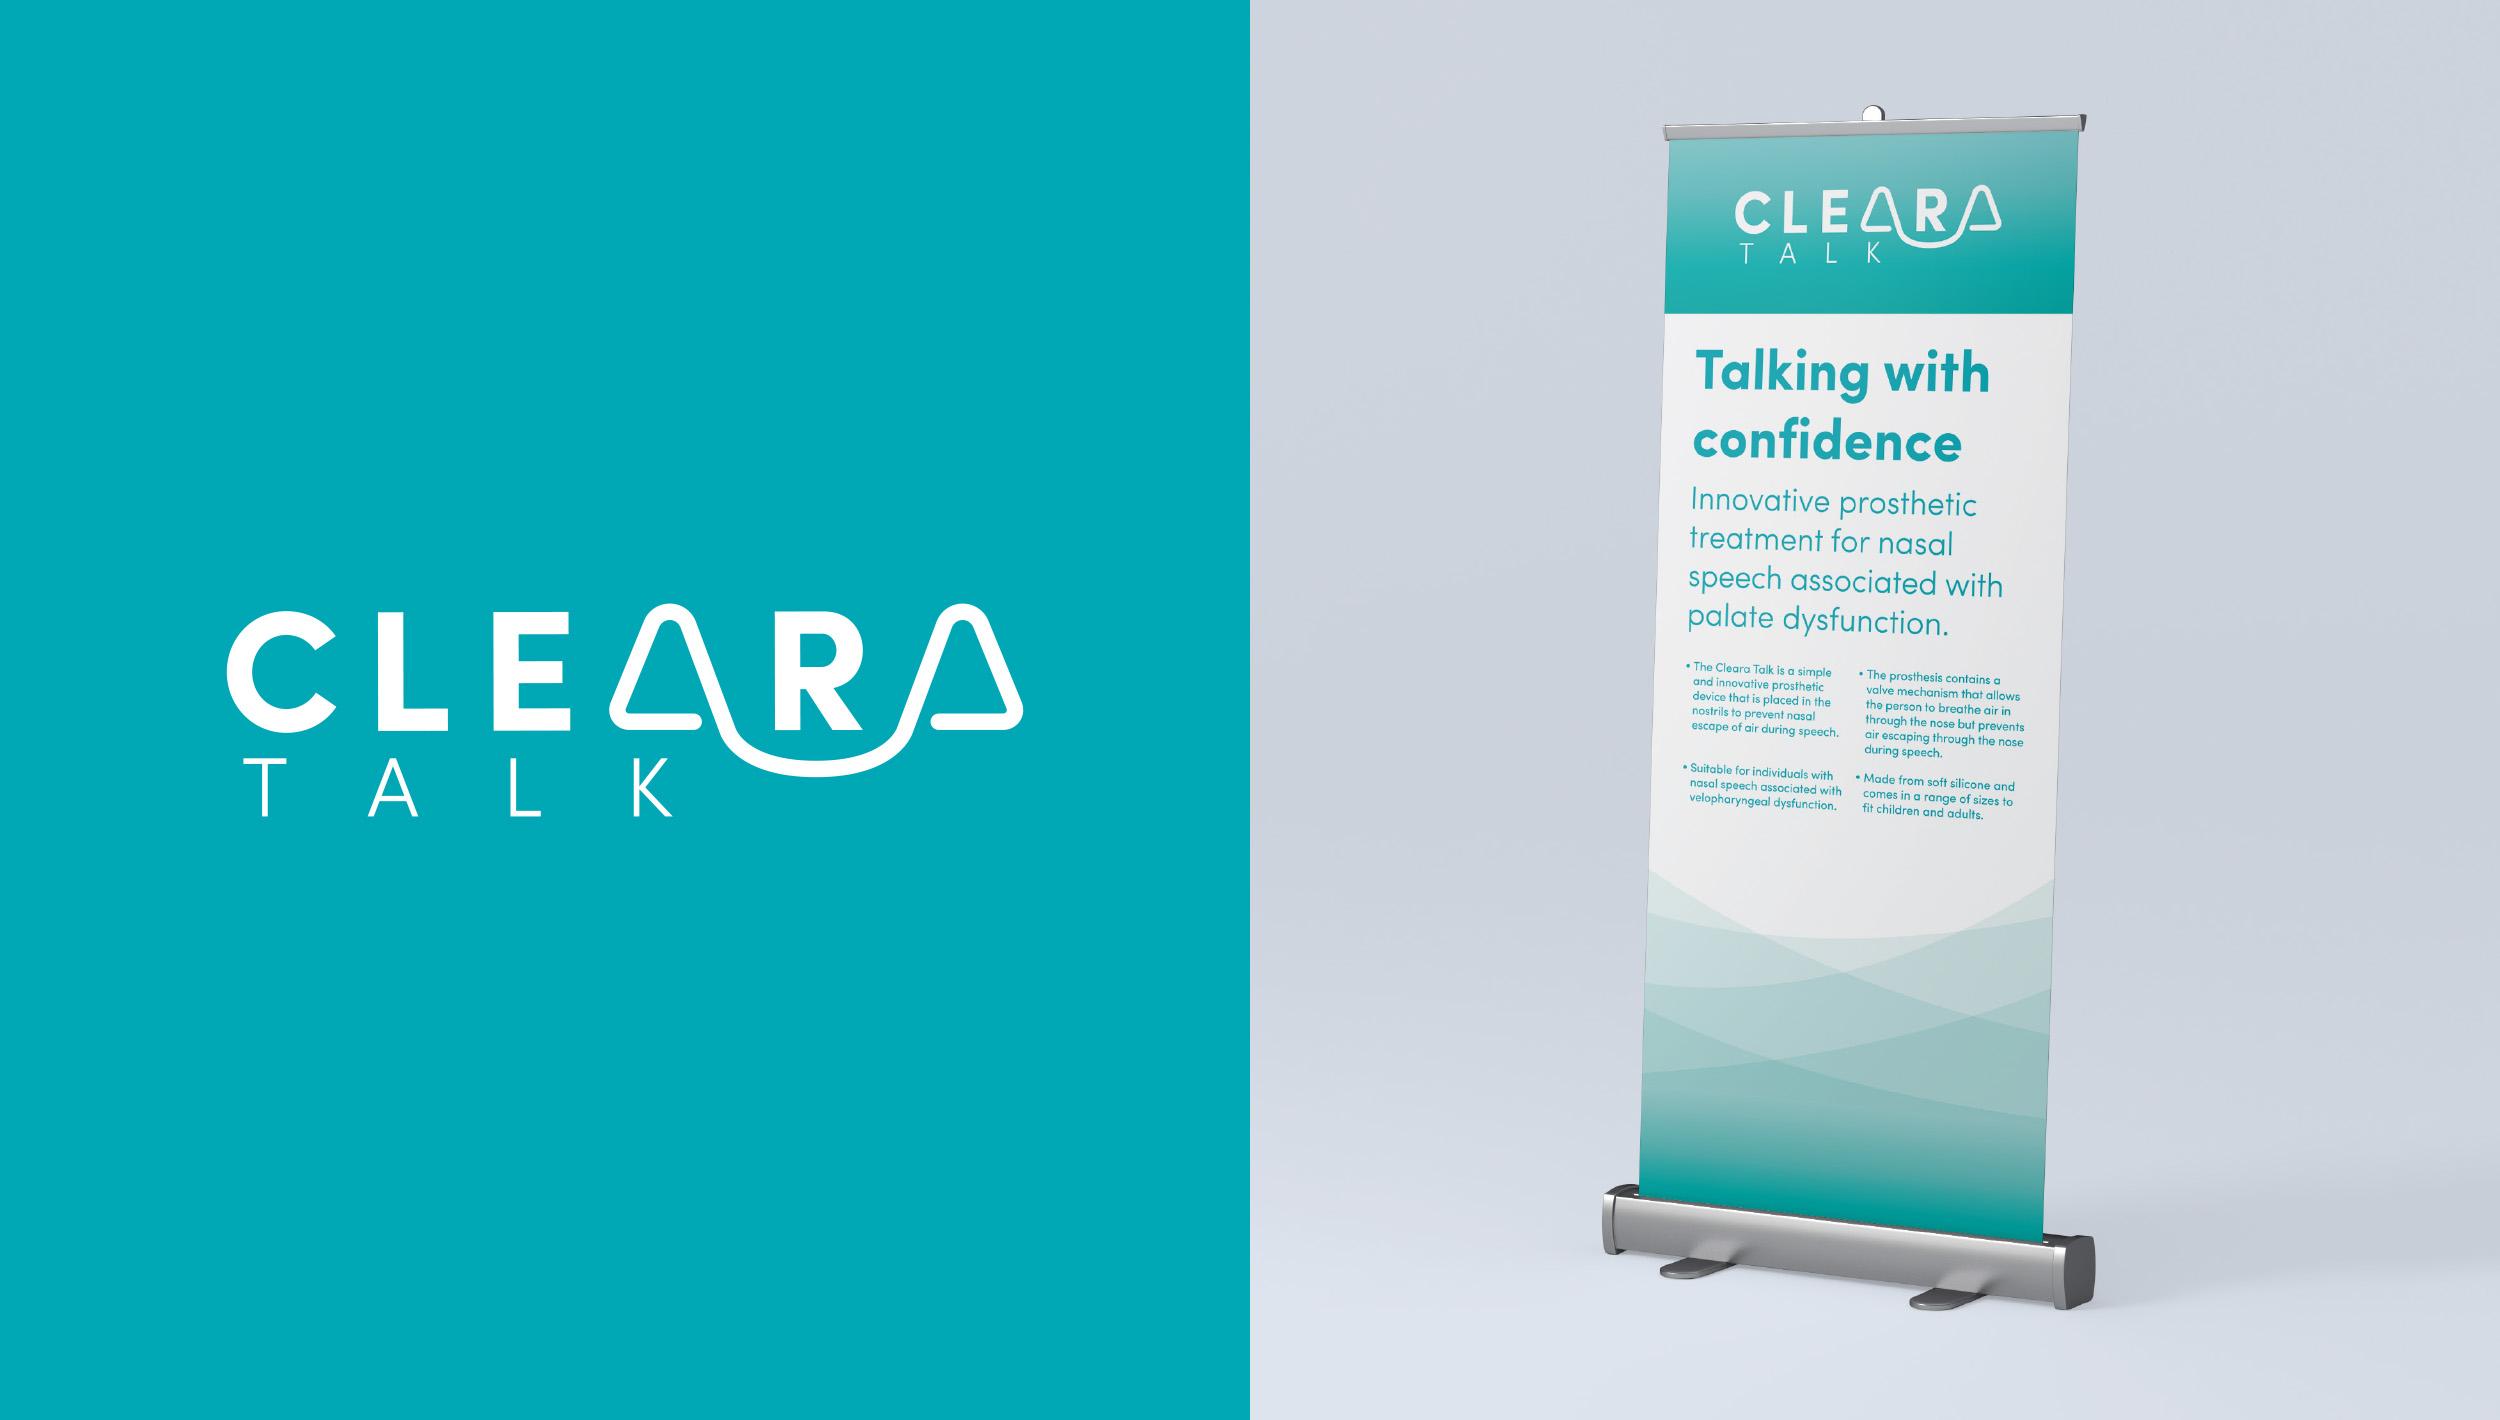 ClearTalk-logos+Banner-2500.jpg